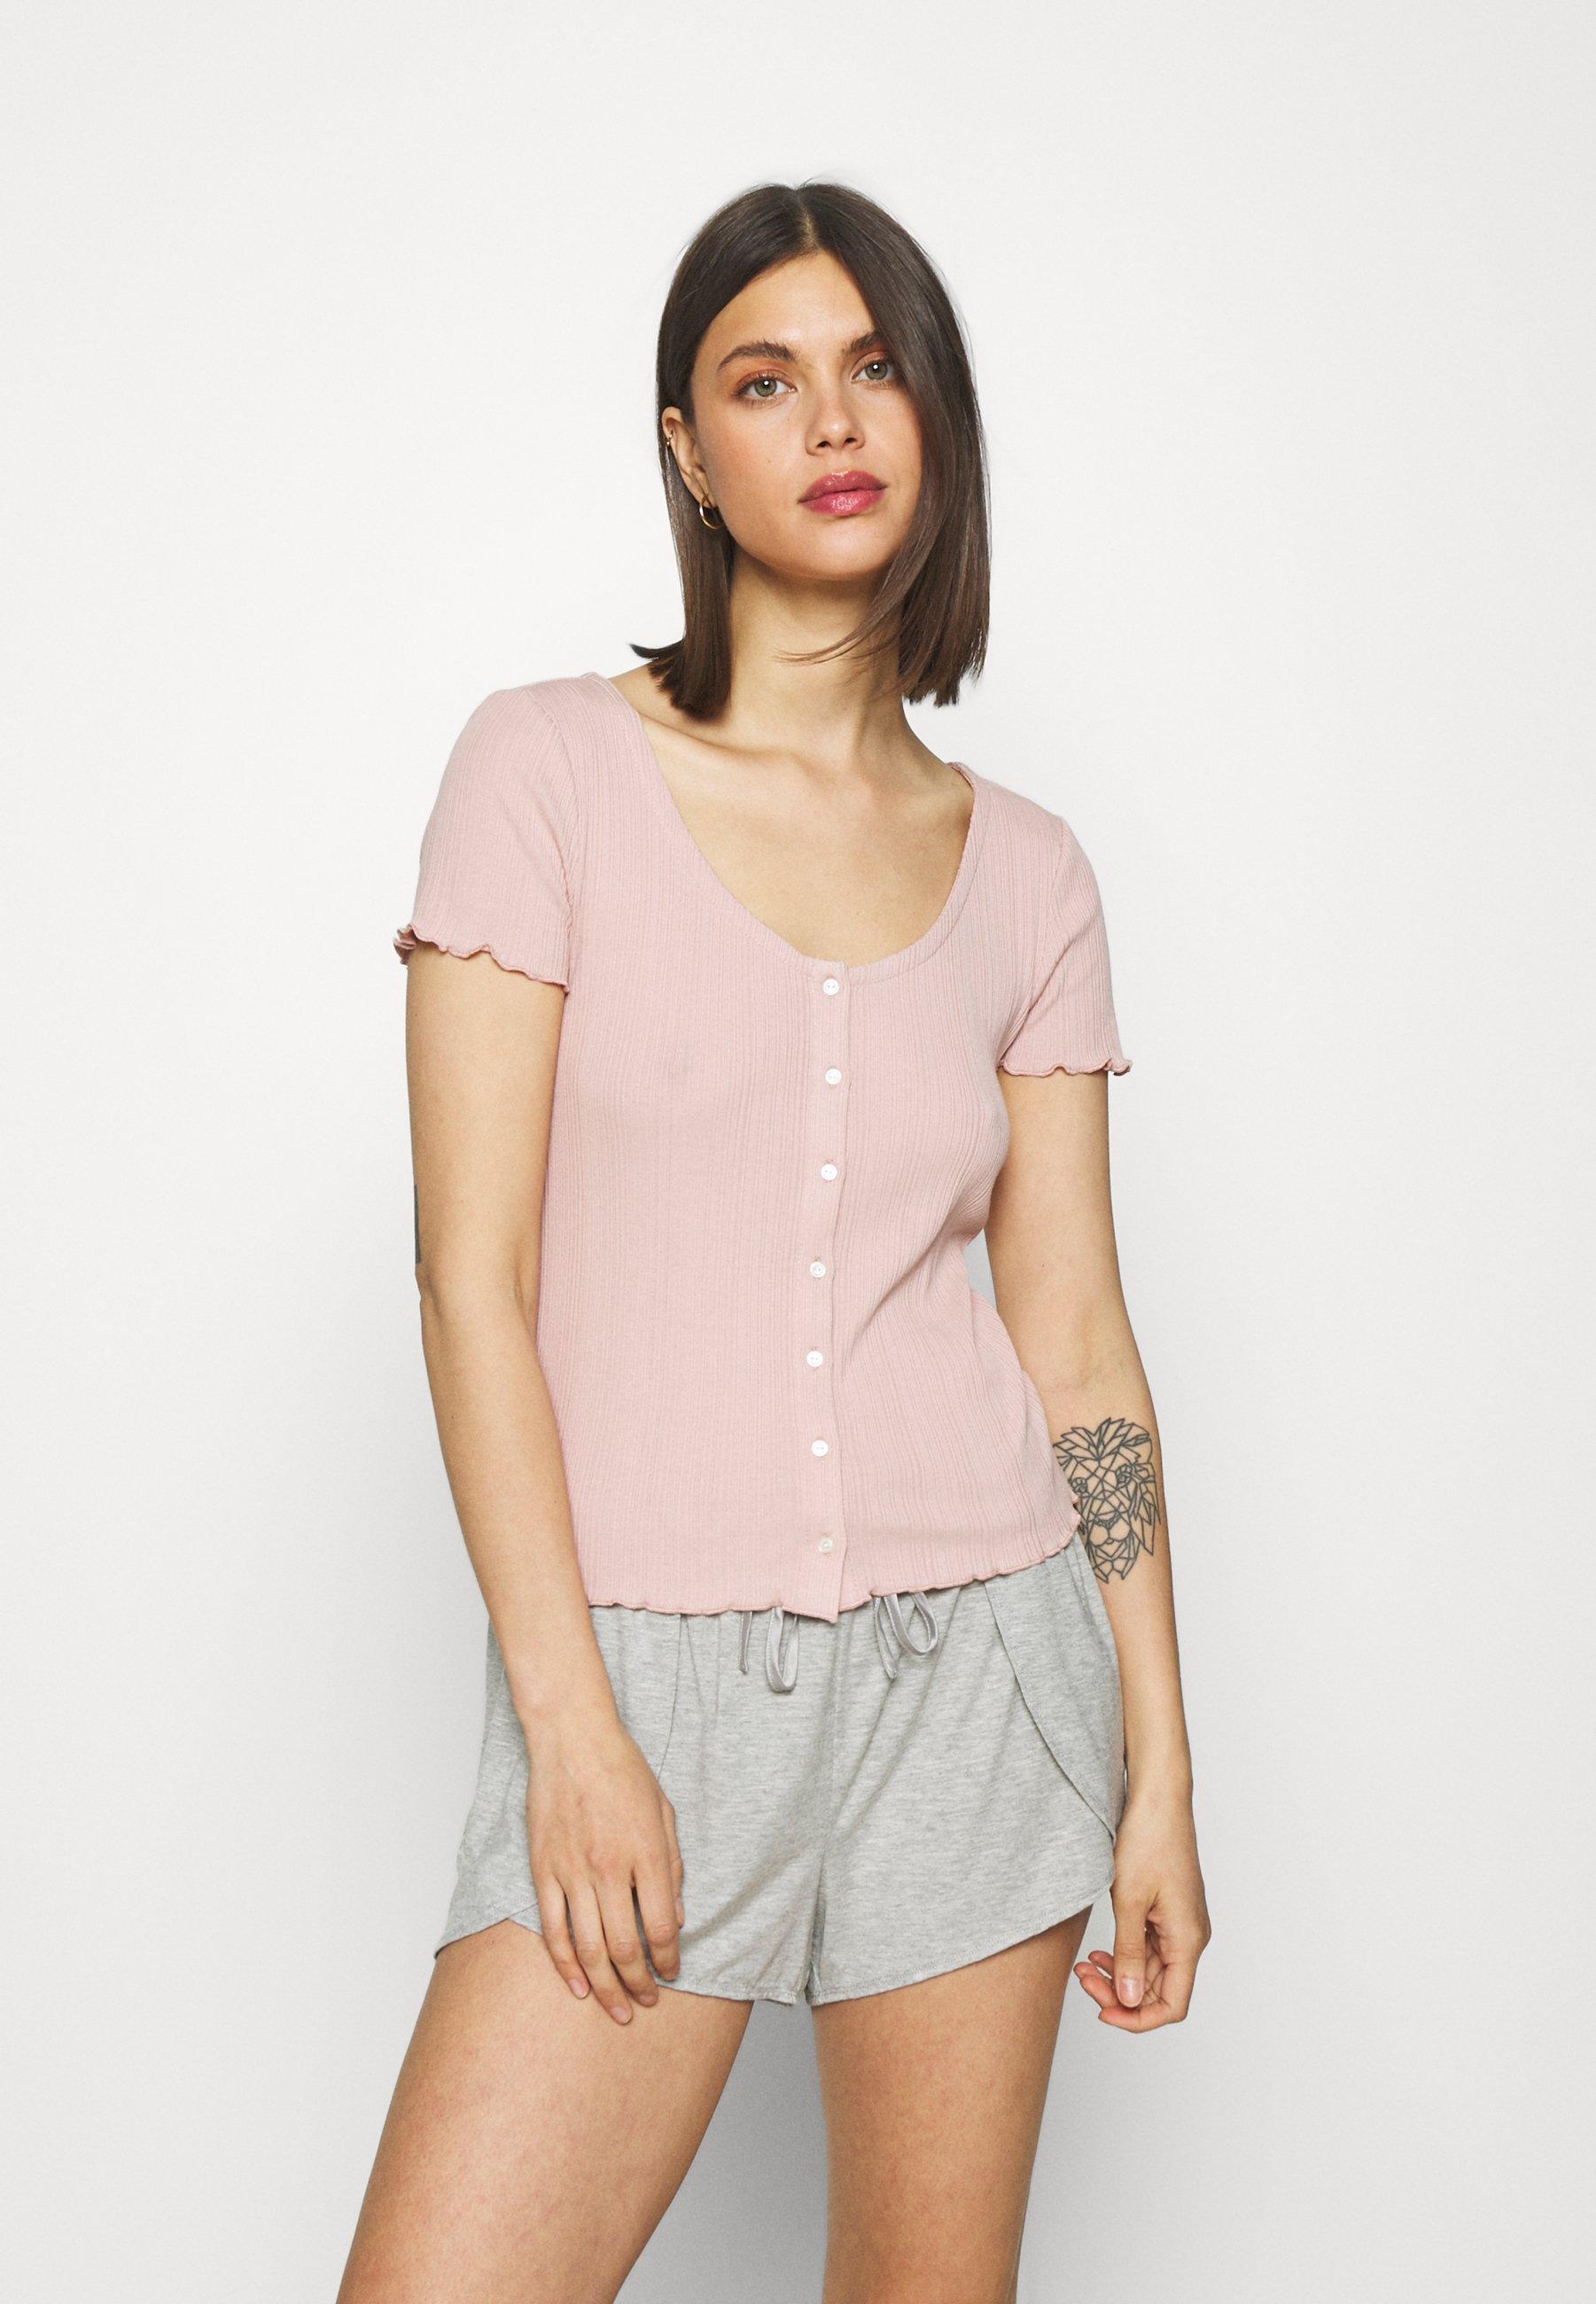 Damen BUTTON TOP - Nachtwäsche Shirt